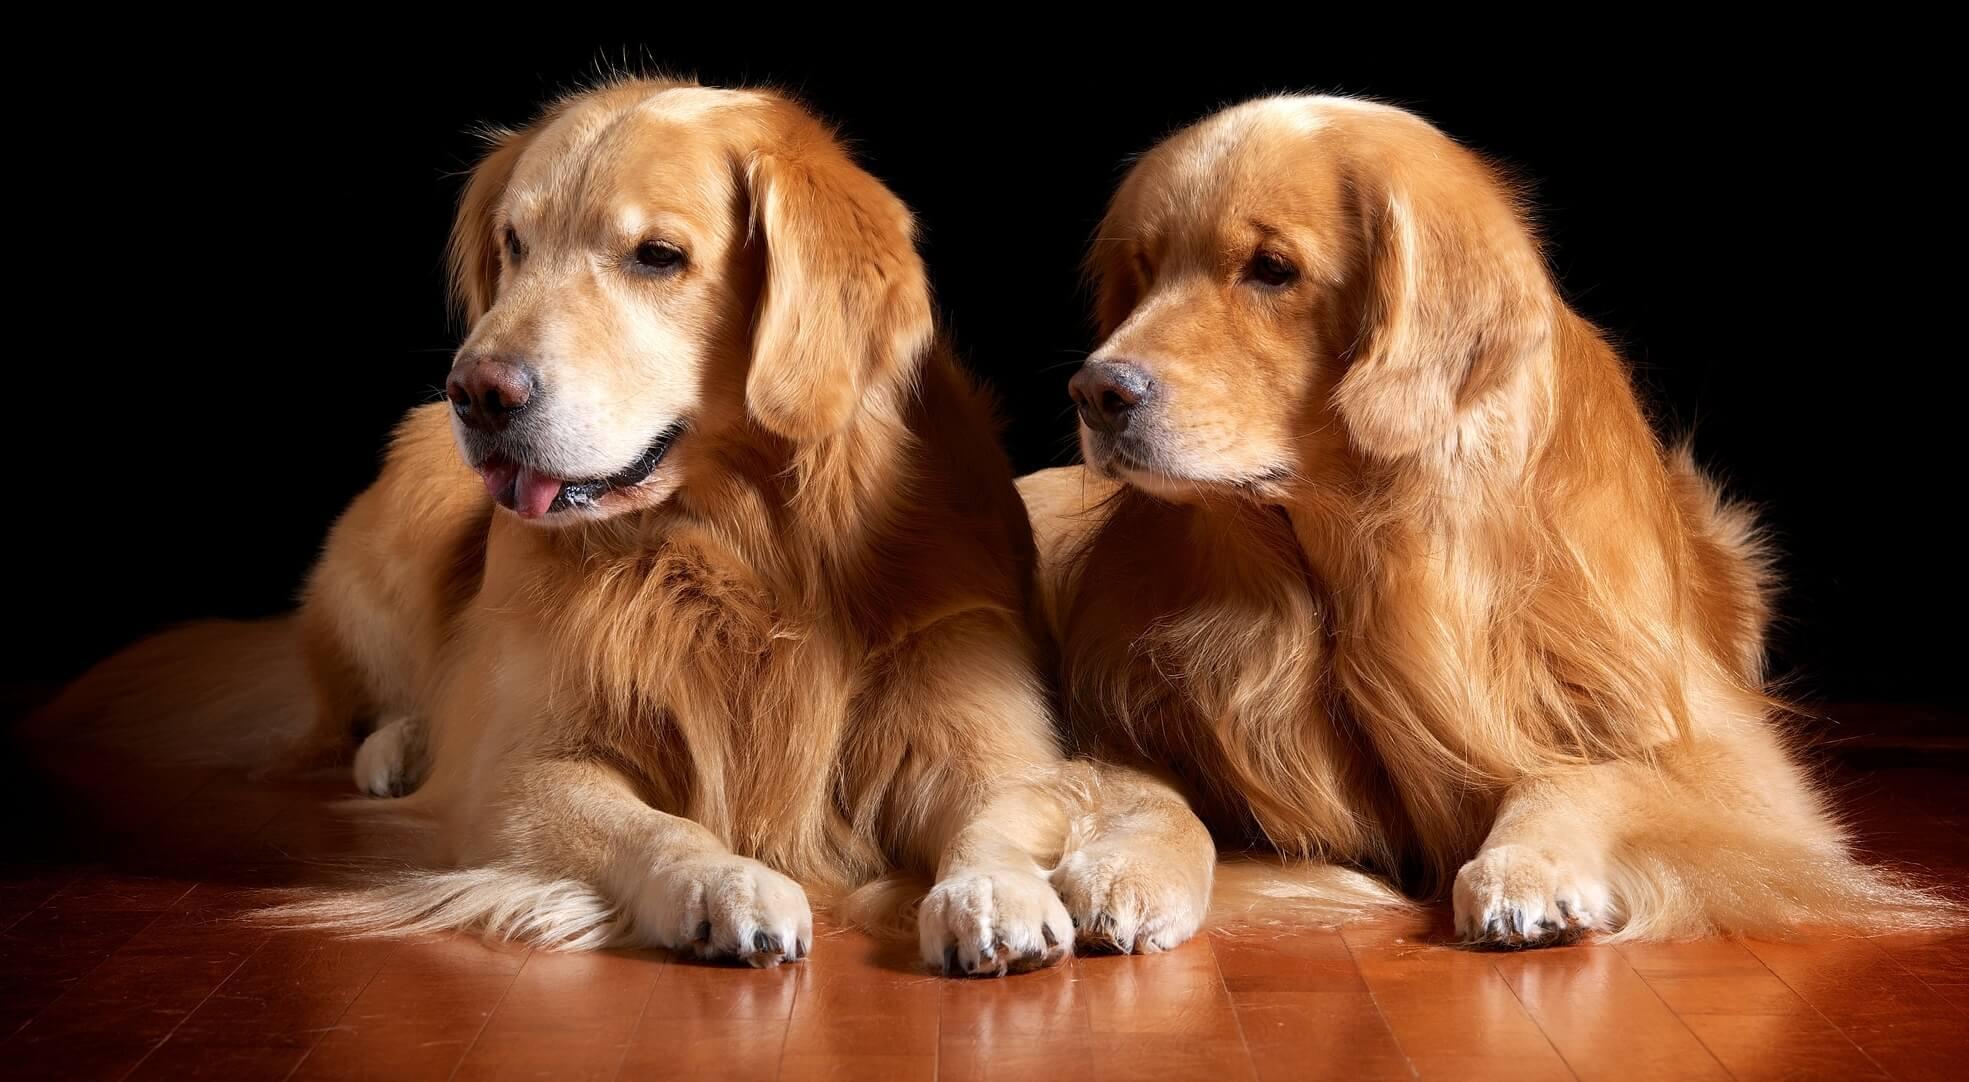 Anjing Golden : Karakter, Variasi Jenis, kelebihan & Harga (Update) 13